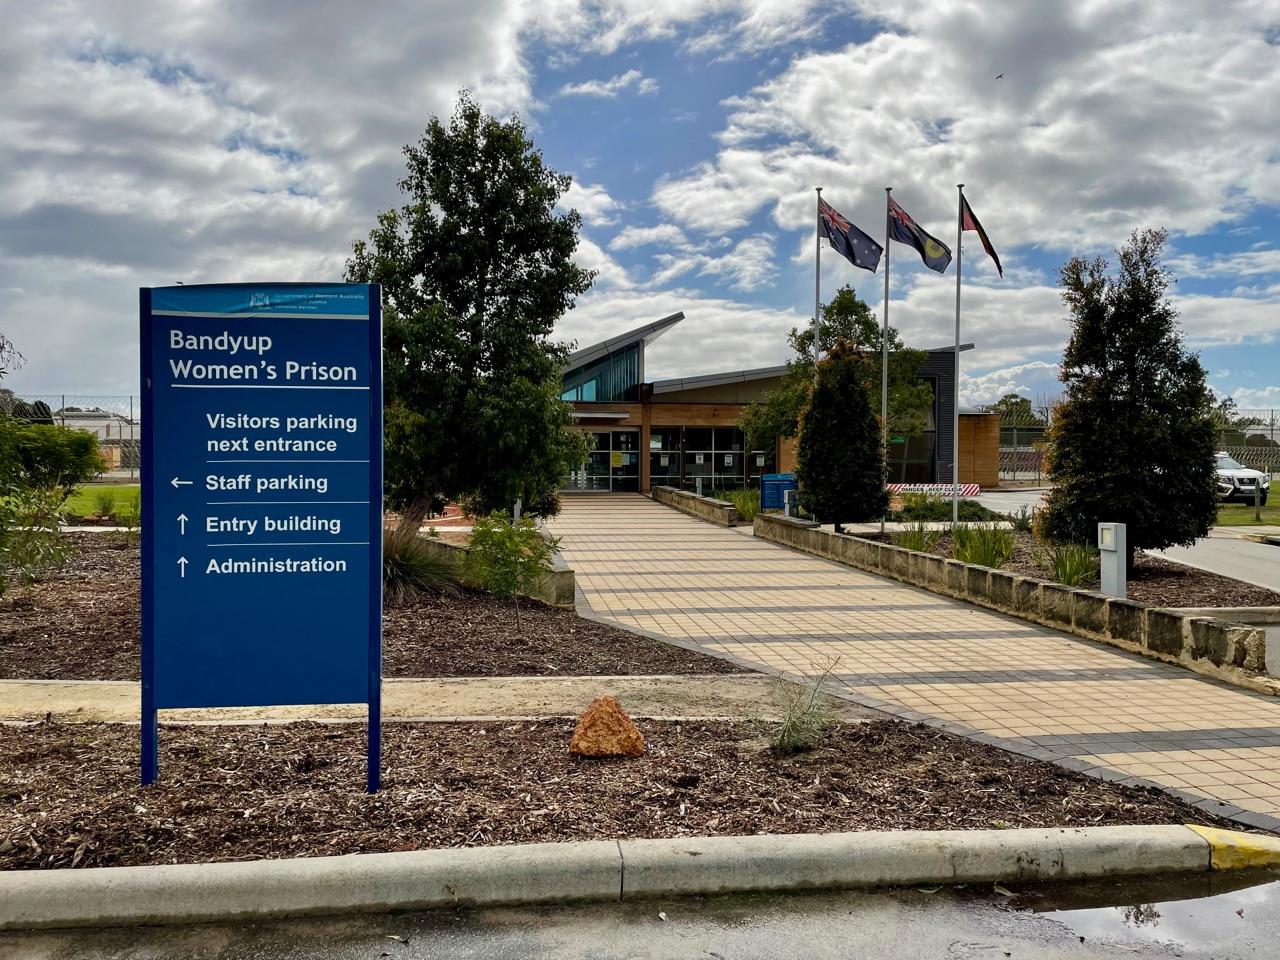 Bindi Bindi has opened at Bandyup Women's Prison, east of Perth